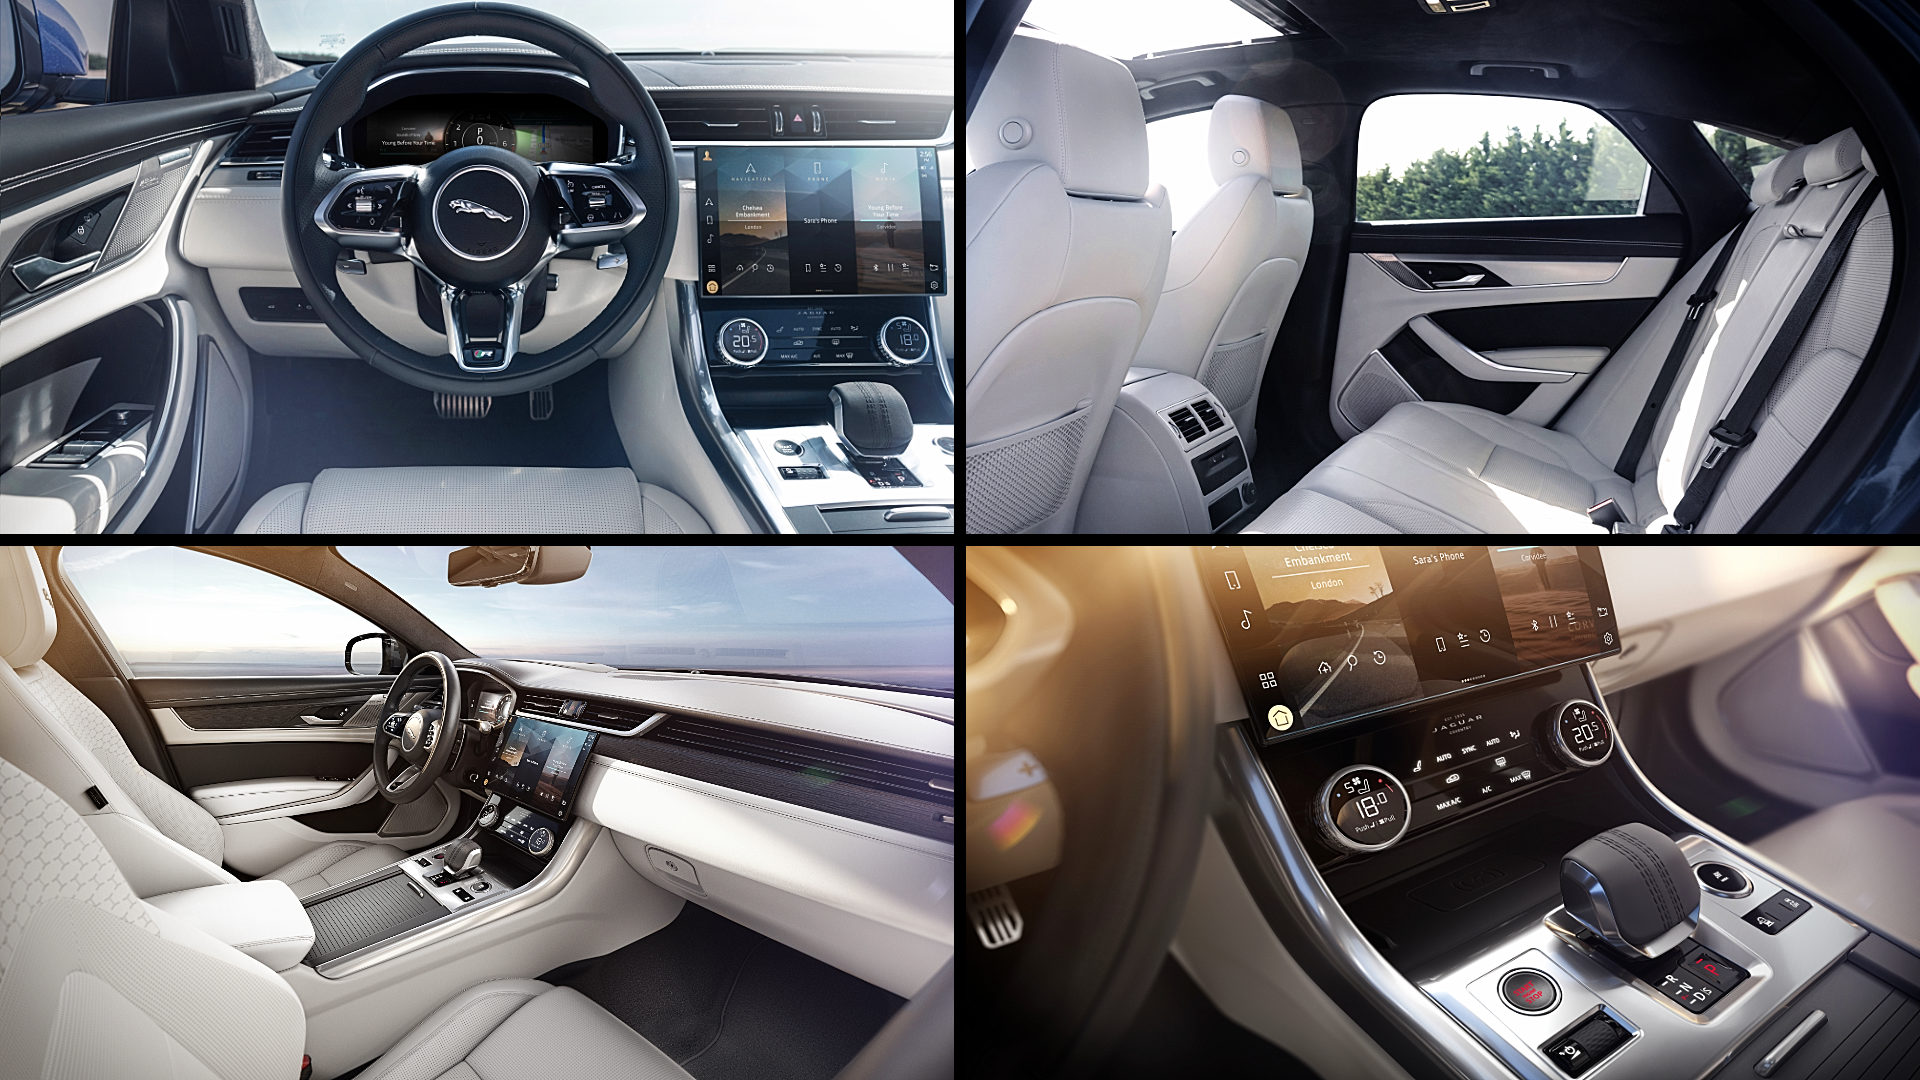 2021 Jaguar XF Saloon Interior